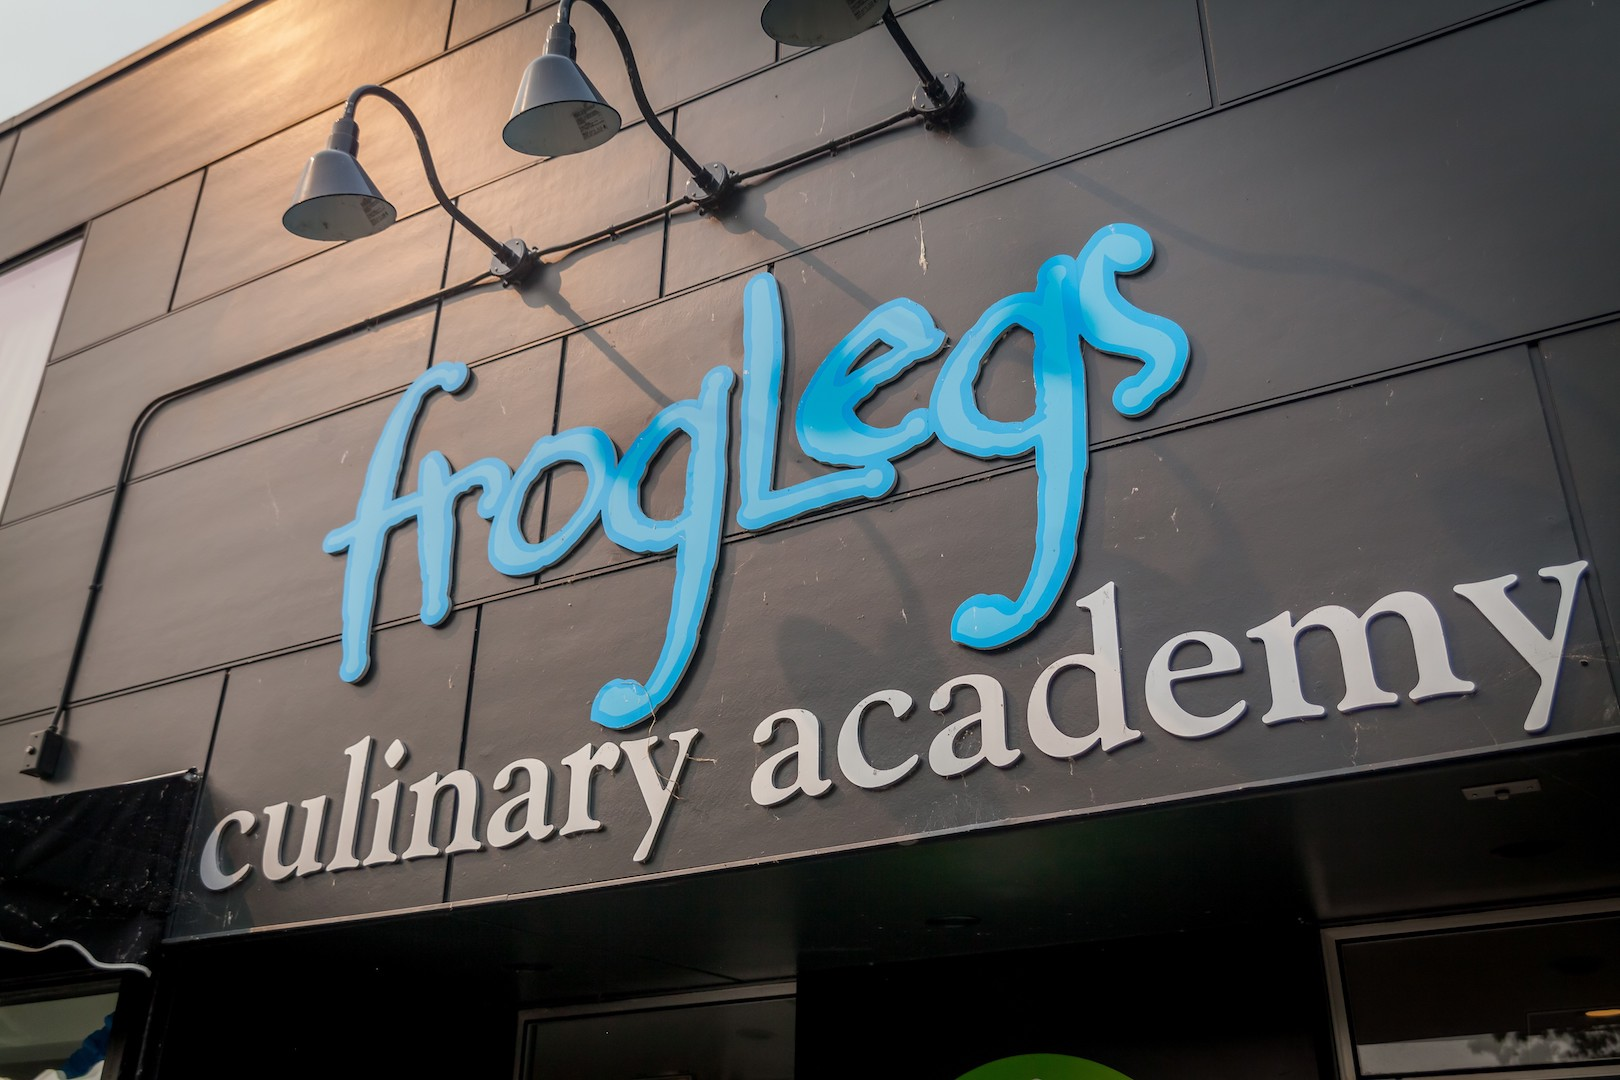 FrogLegs2.jpg